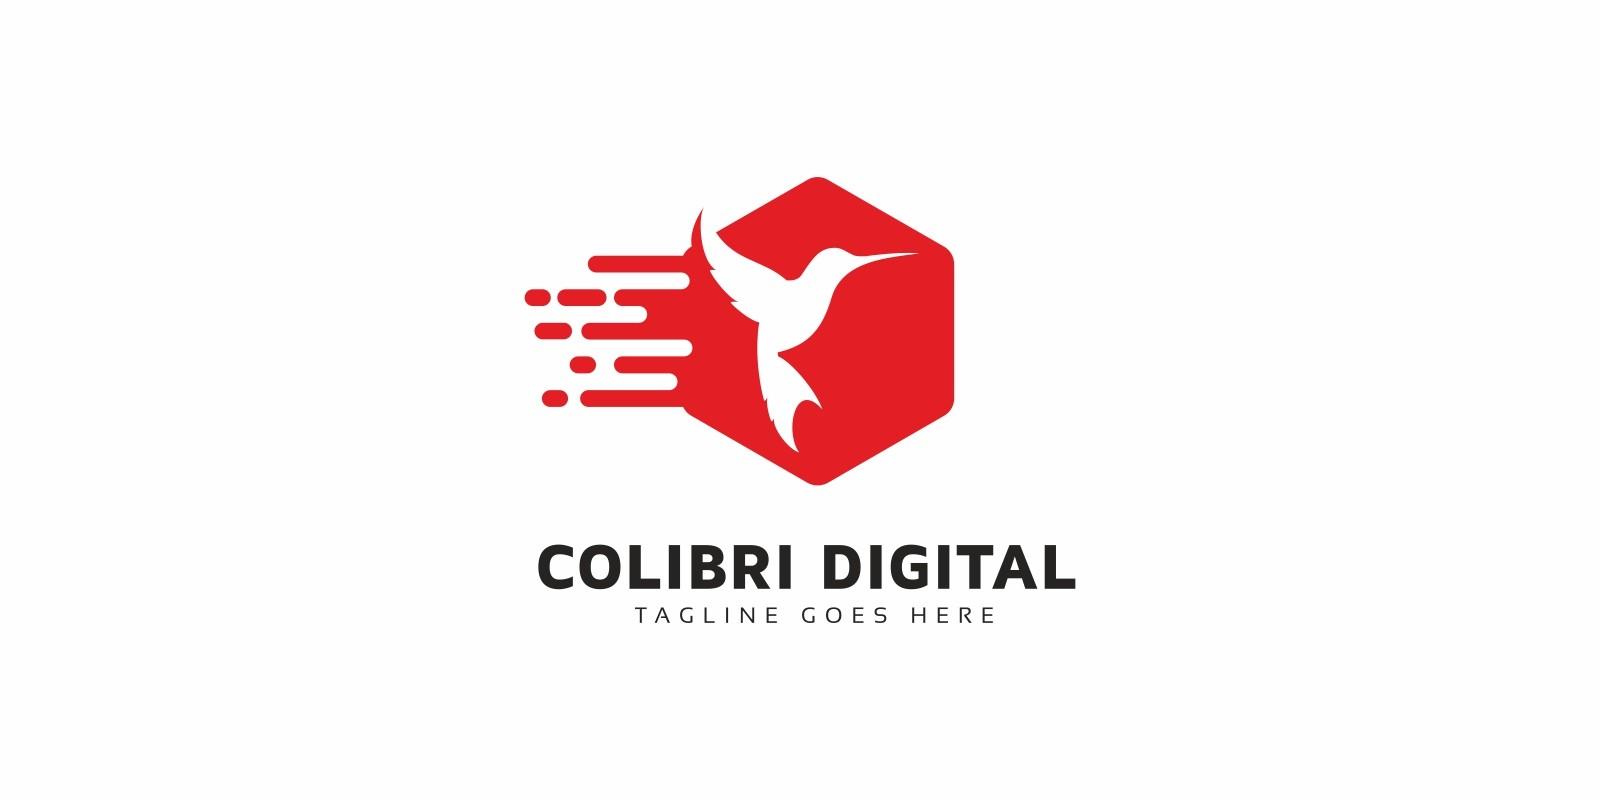 Colibri Digital Logo